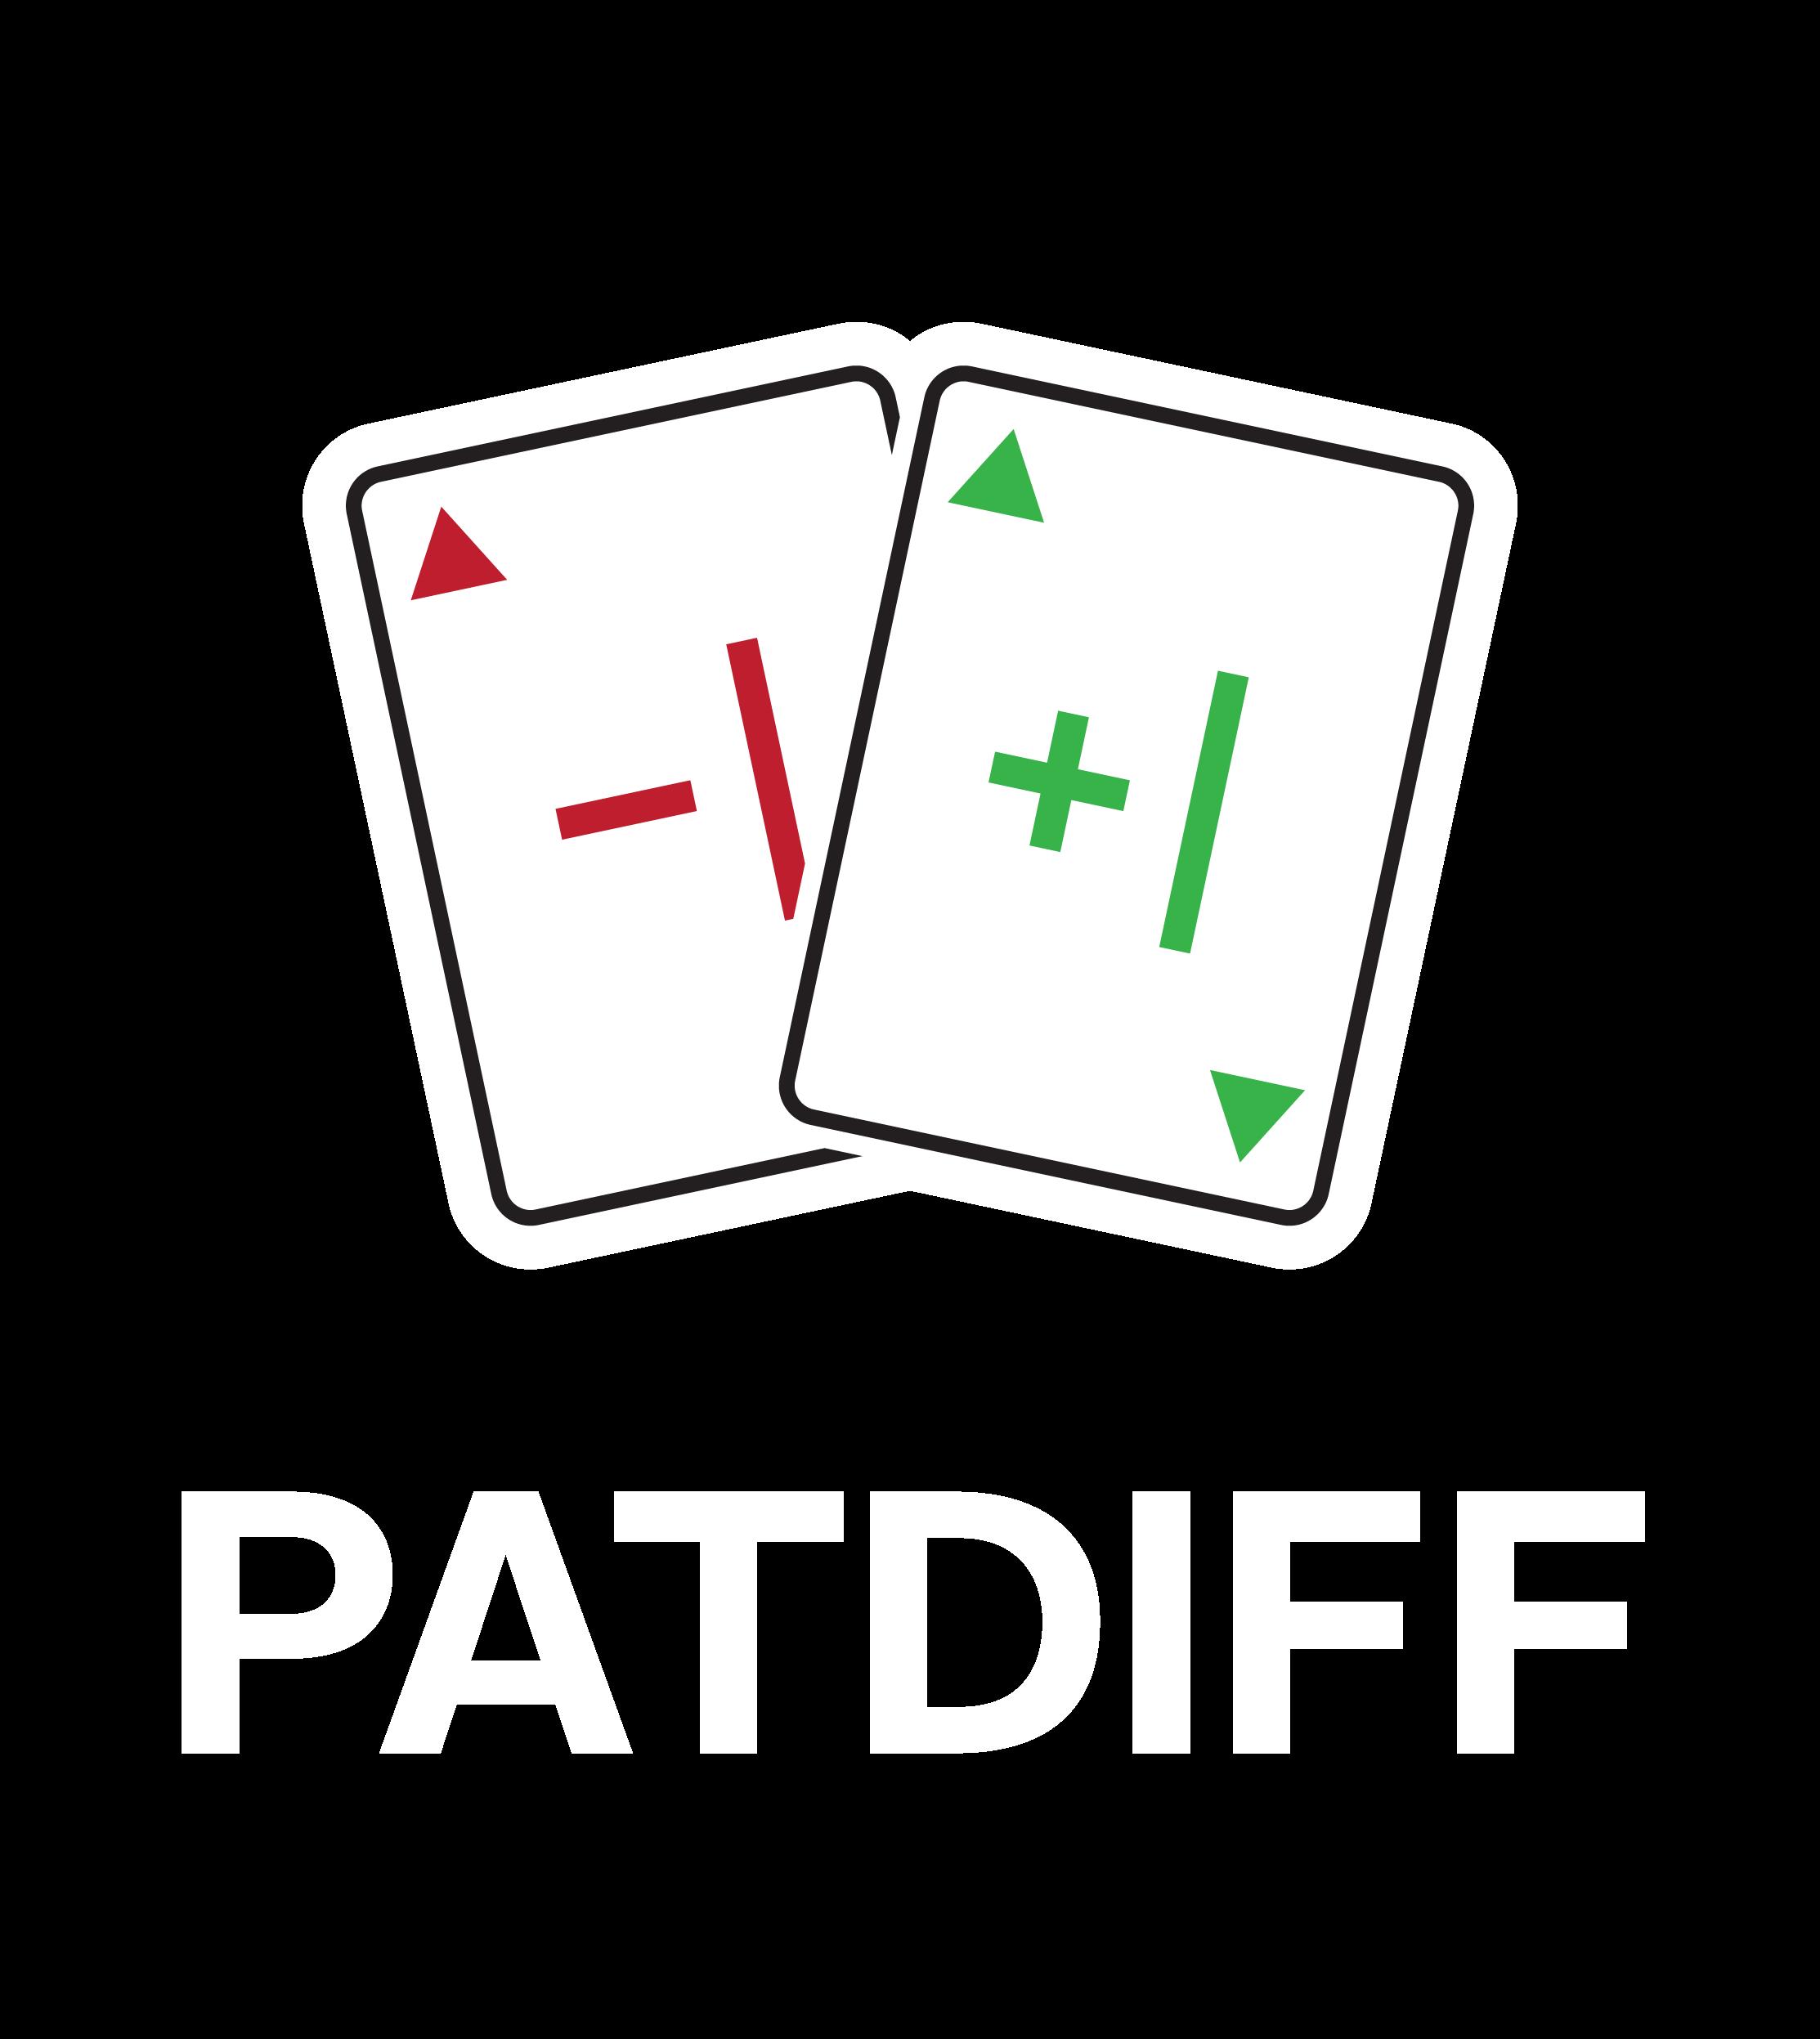 Patdiff